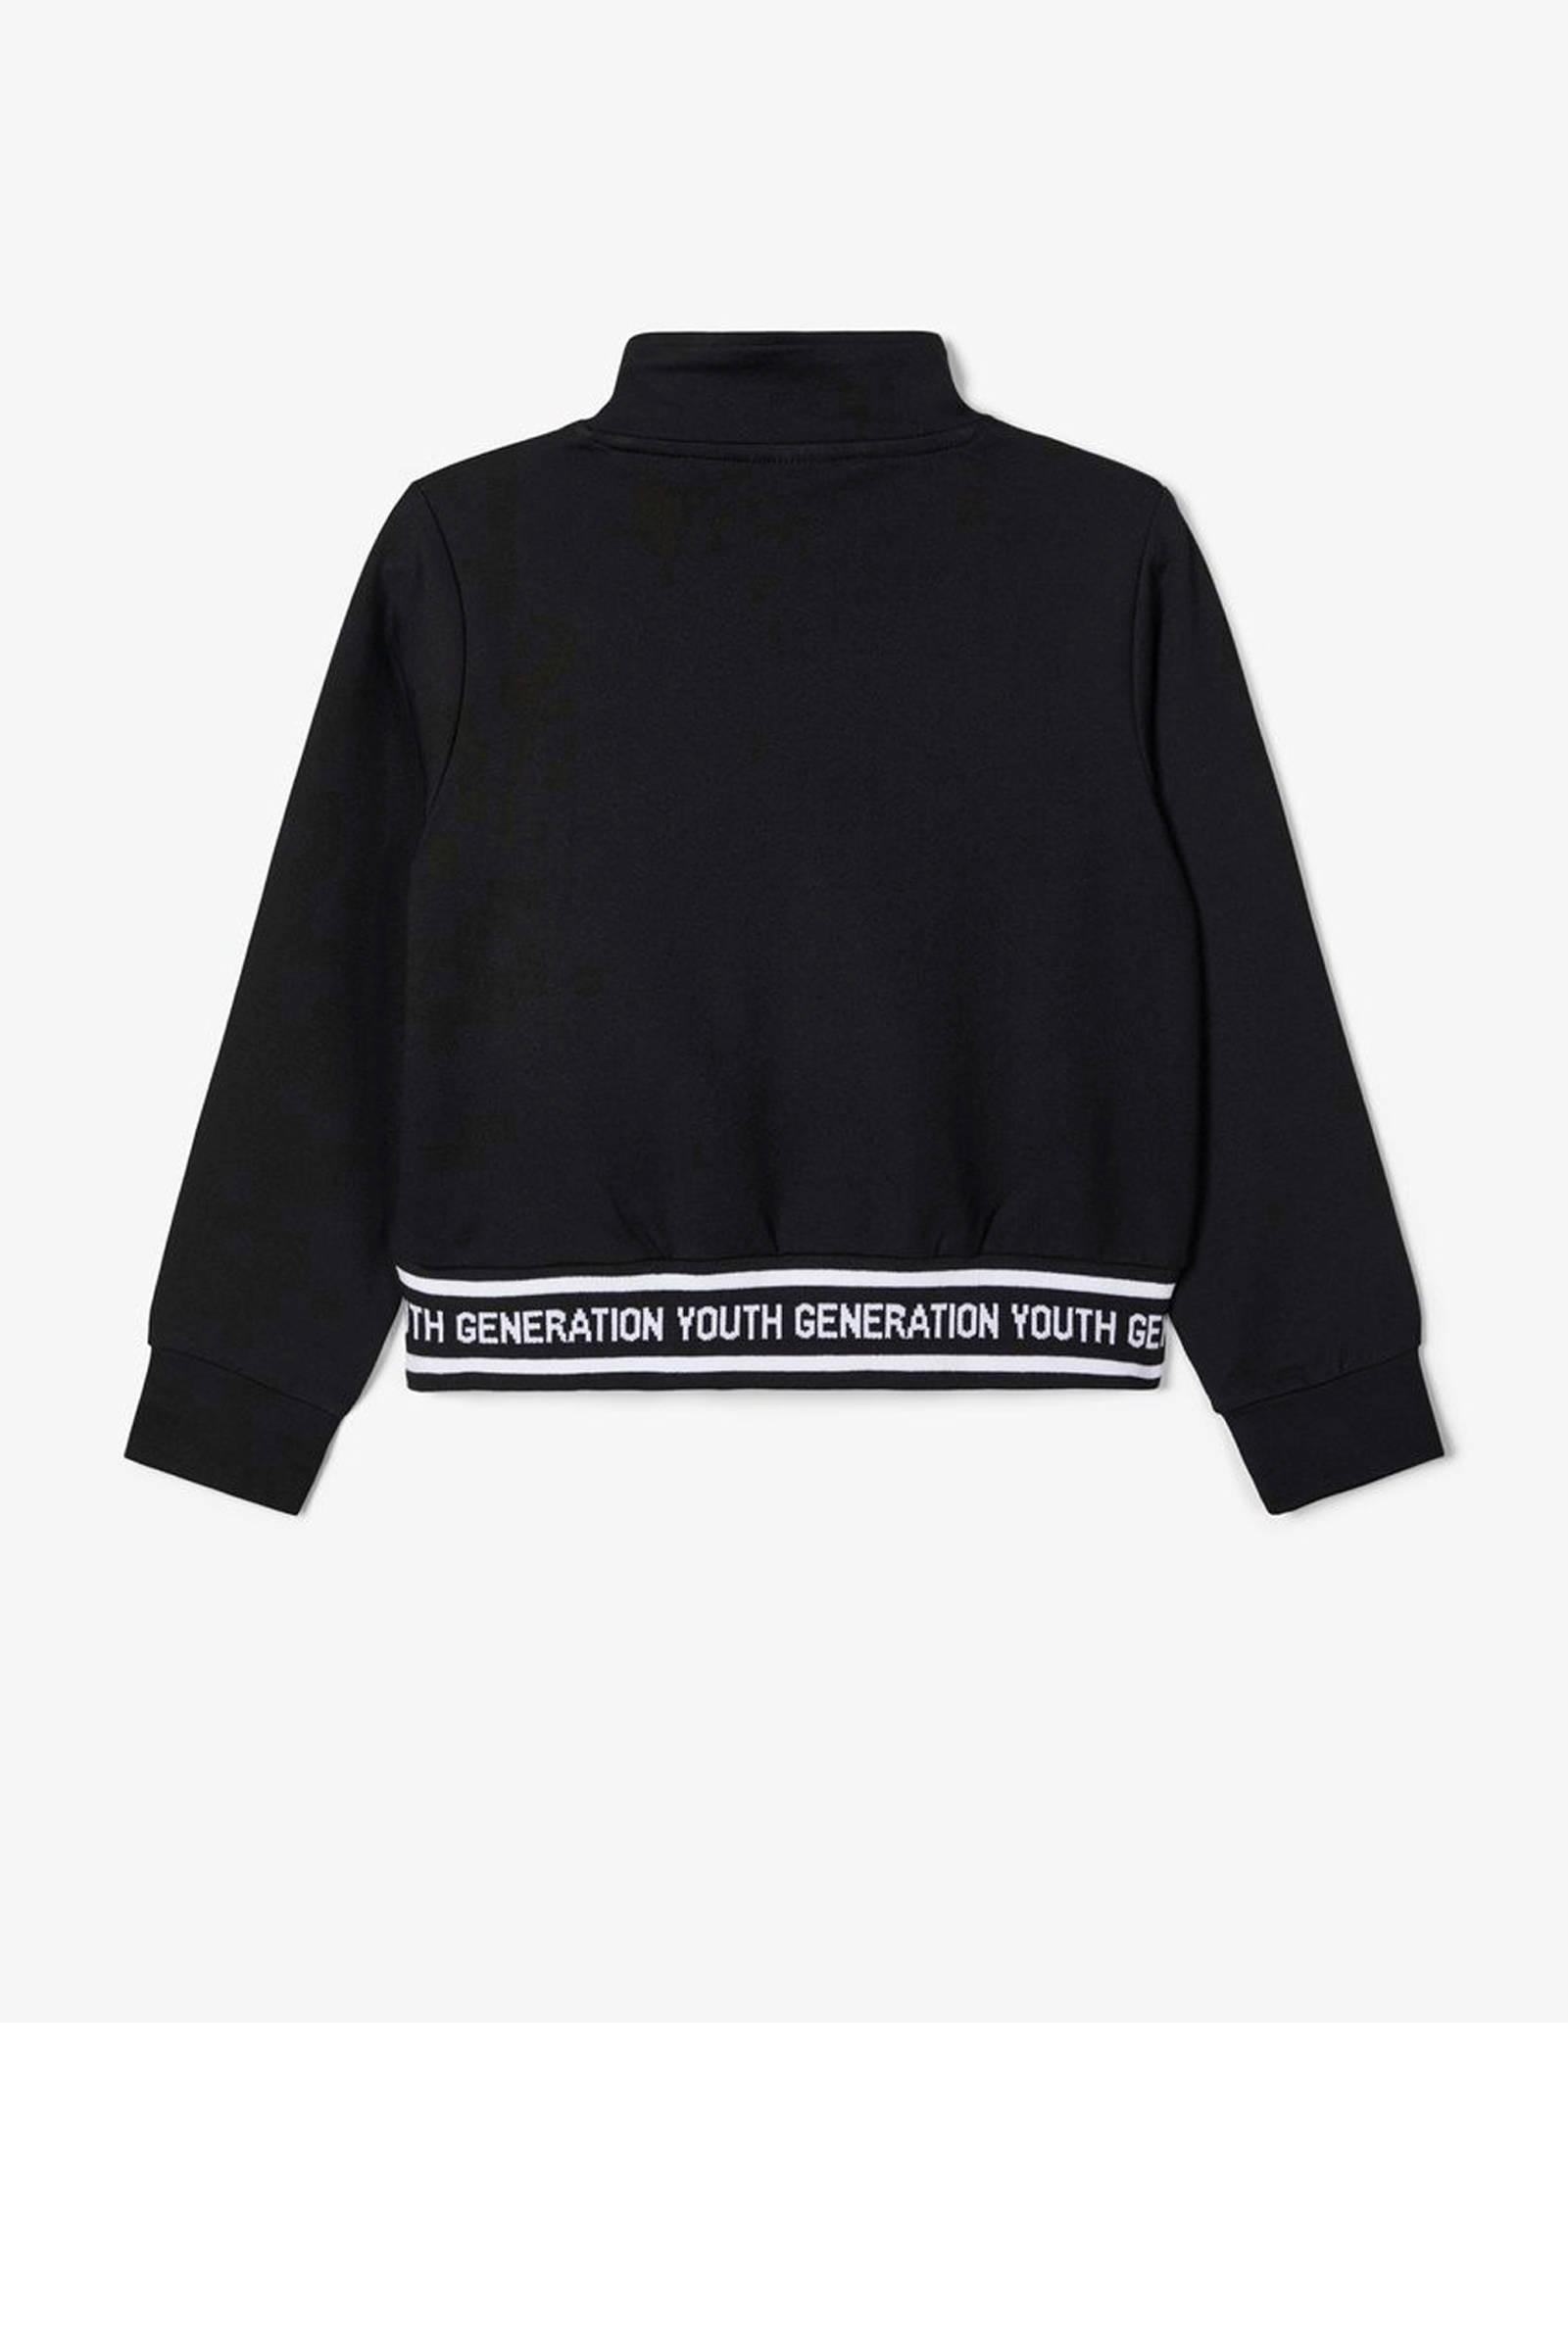 NAME IT KIDS sweater Naba met tekst zwartwit | wehkamp